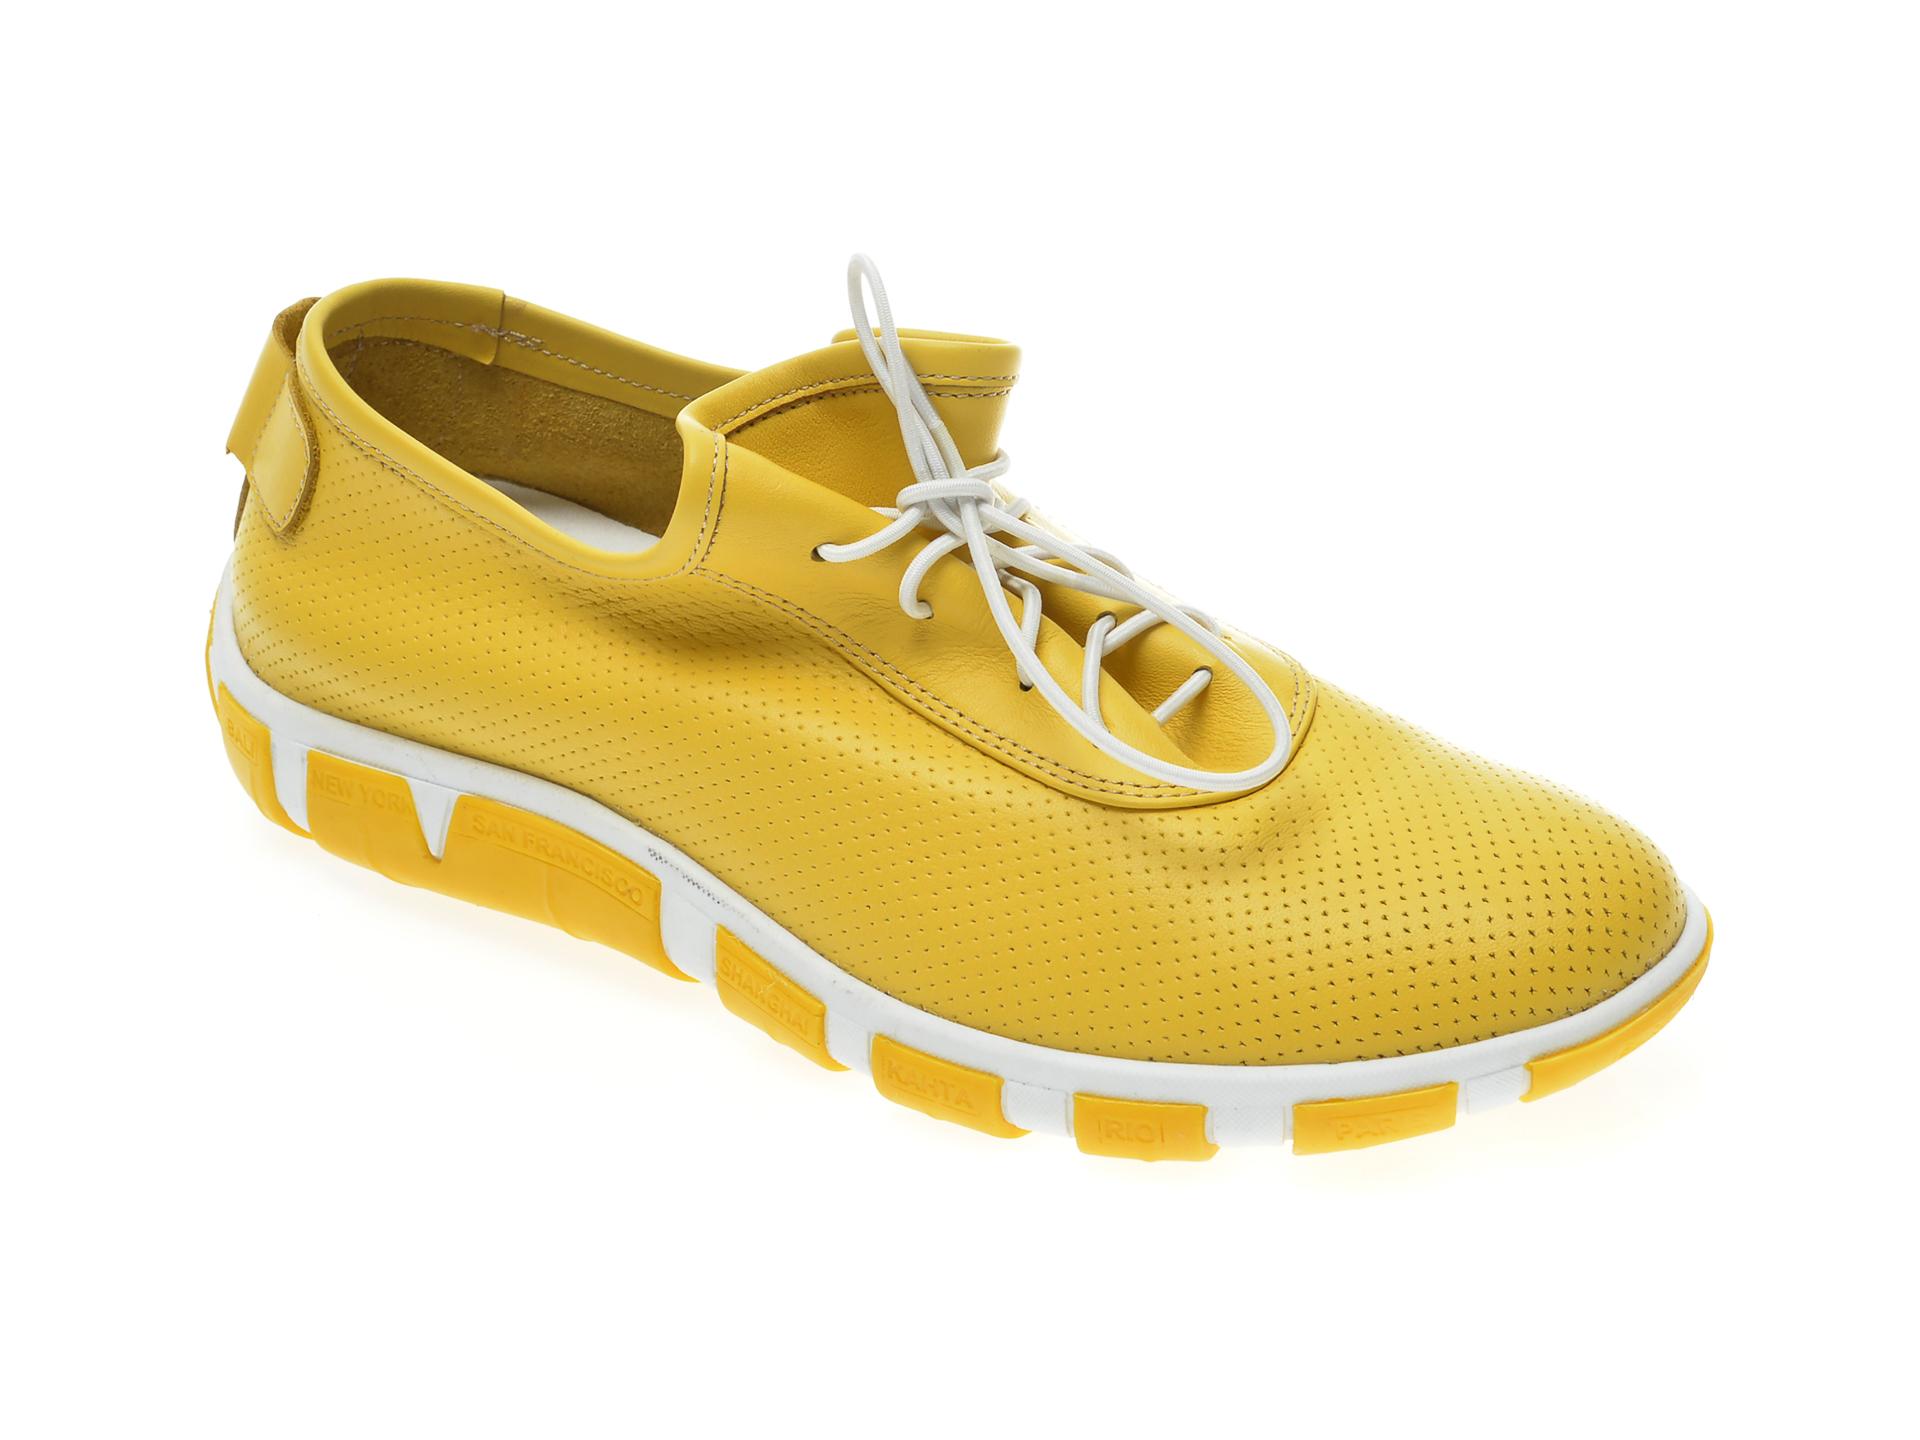 Pantofi Le Berde Galbeni, 52, Din Piele Naturala